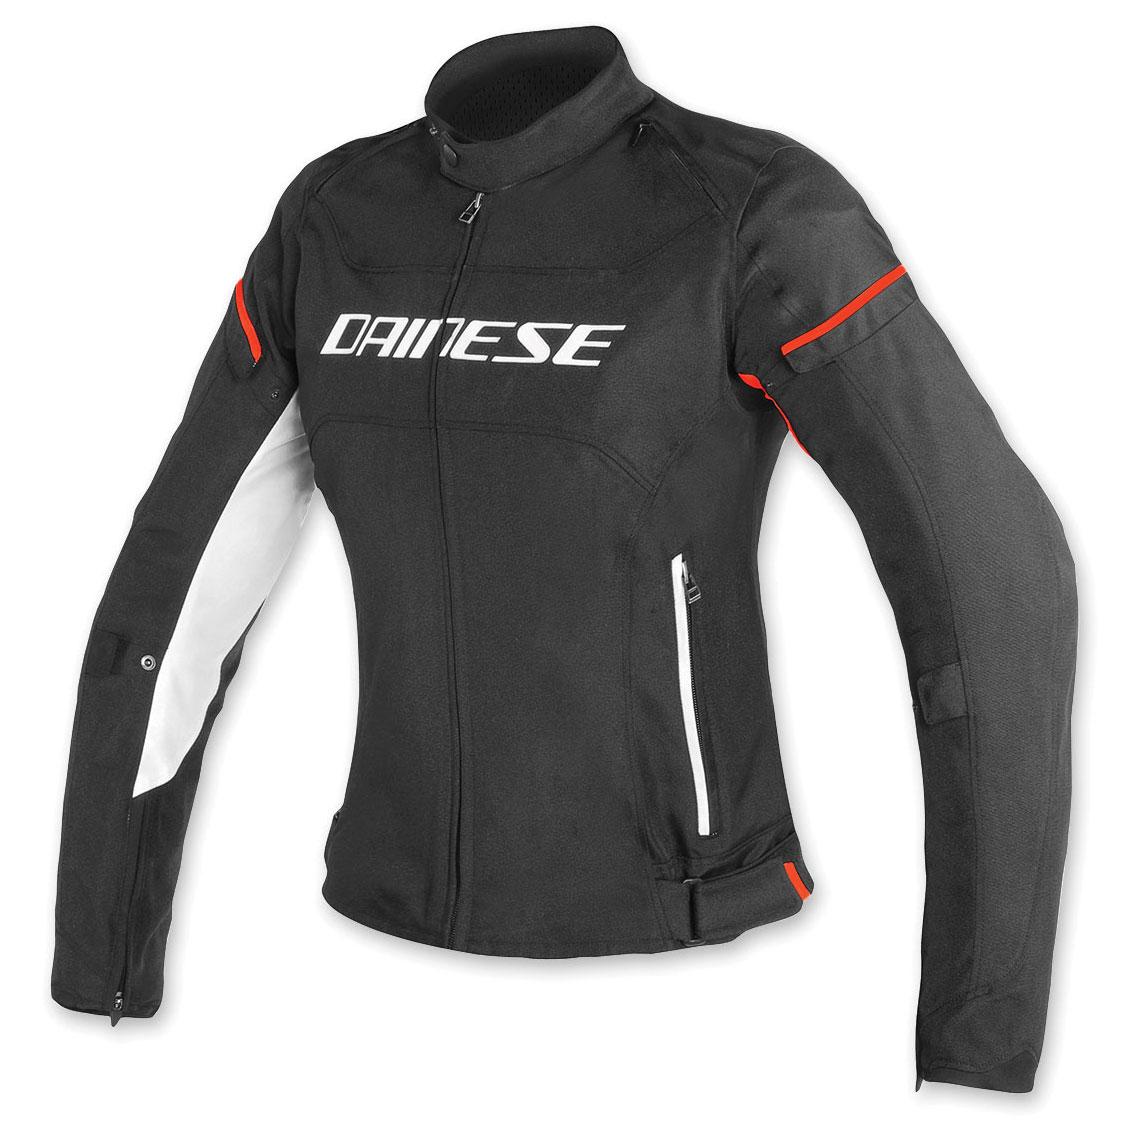 Dainese Women's D-Frame Black/White/Red Textile Jacket